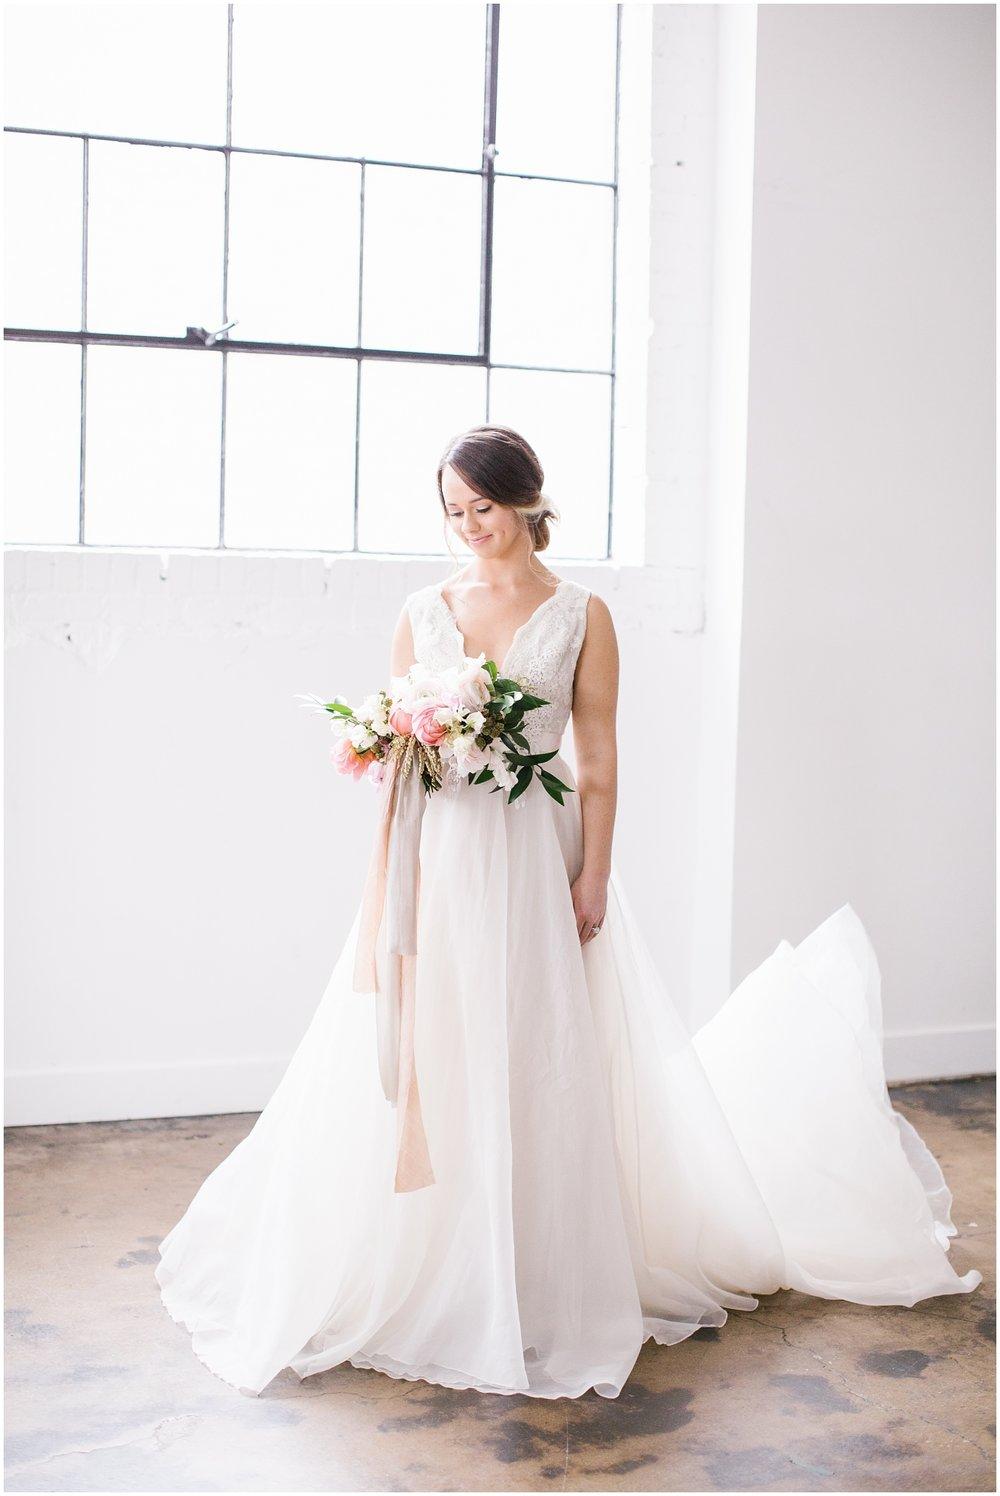 Styled Shoot2-17-8_Lizzie-B-Imagery-Utah-Wedding-Photographer-Park-City-Salt-Lake-City-Charcoal-Loft-Studio.jpg